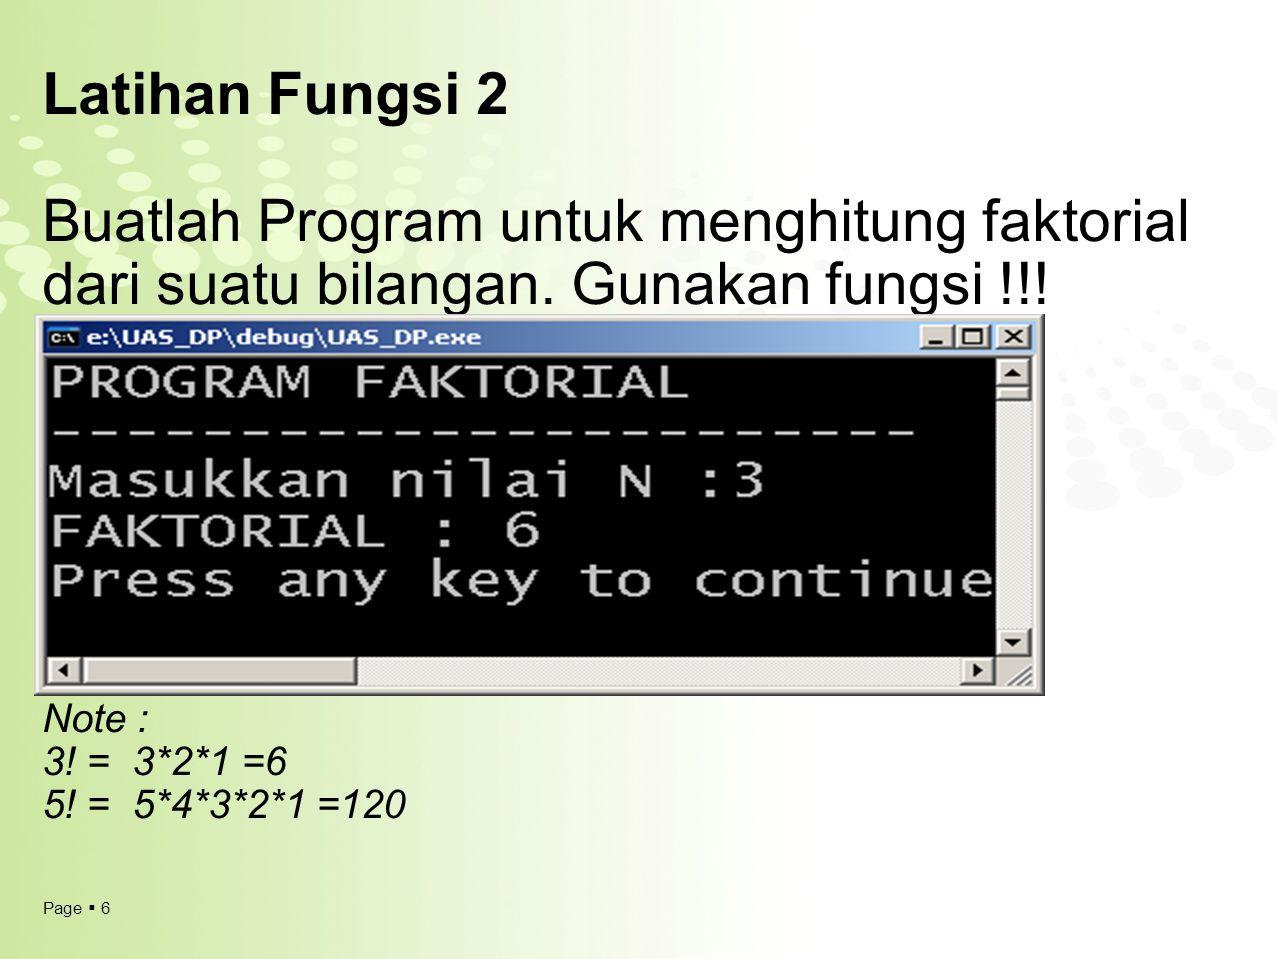 Latihan Fungsi 2 Buatlah Program untuk menghitung faktorial dari suatu bilangan.